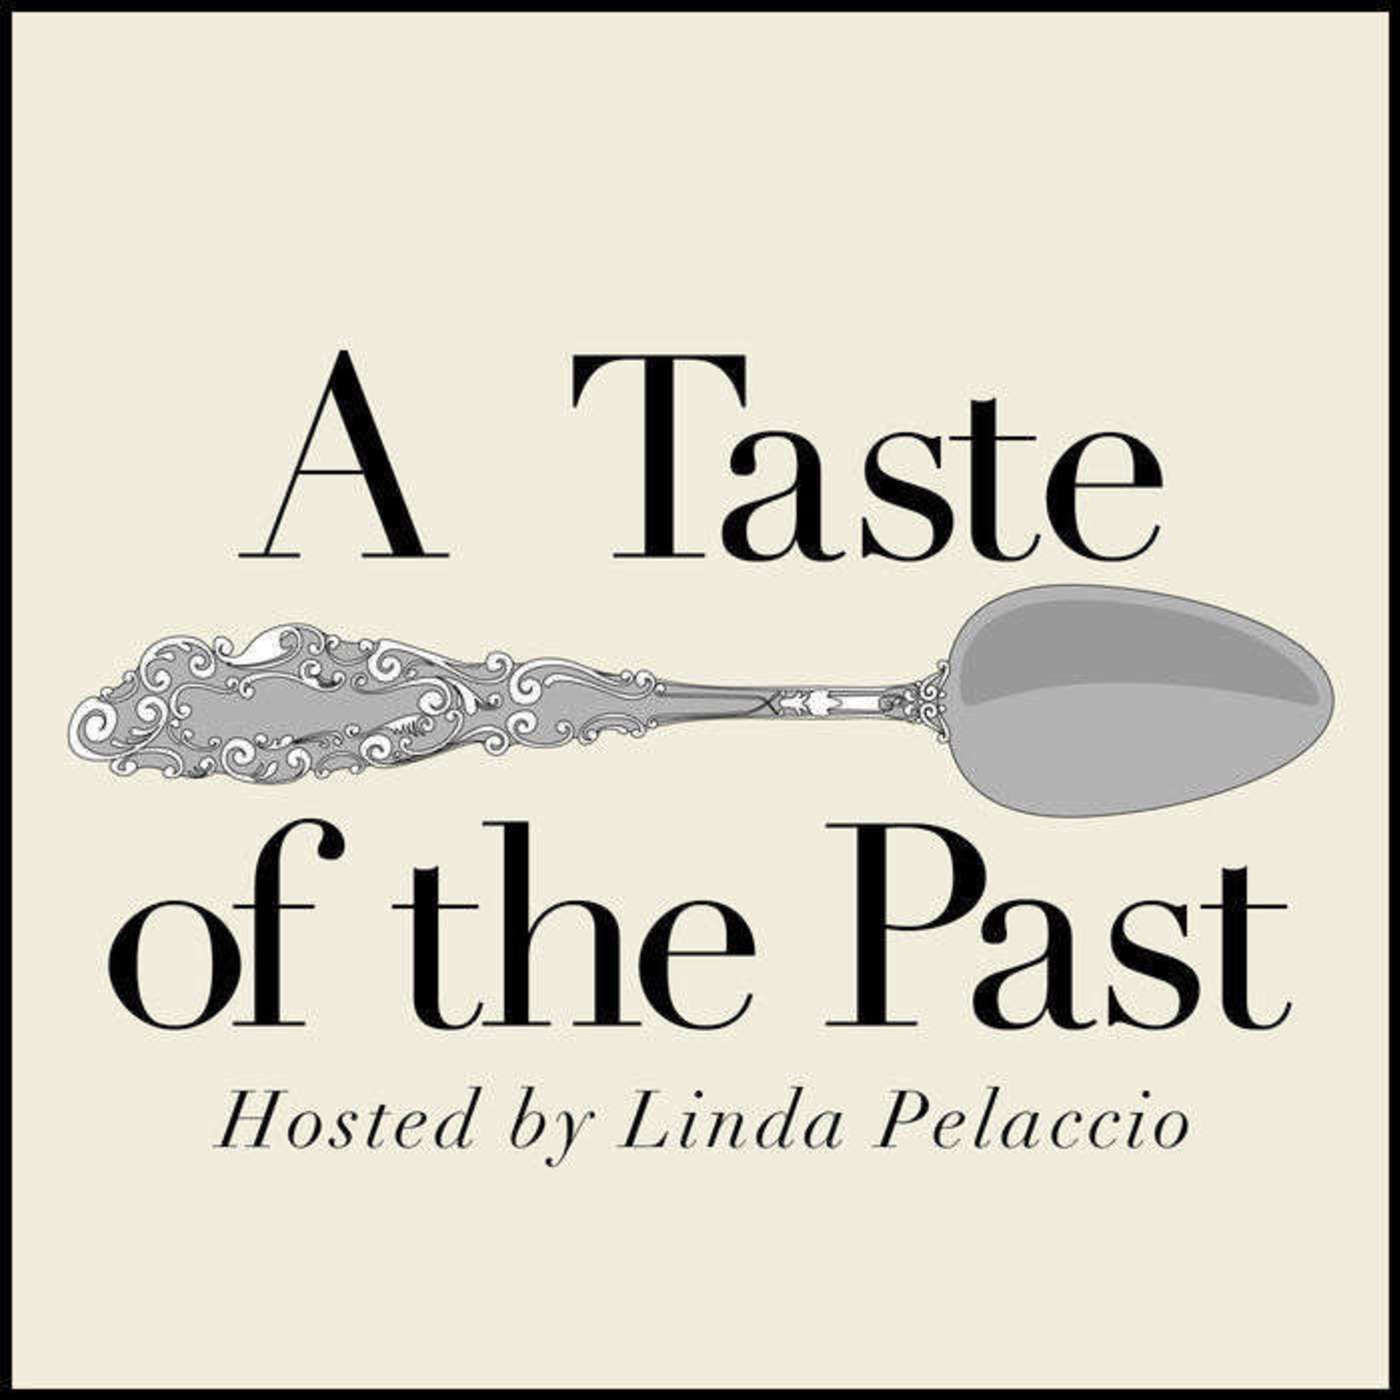 Episode 194: Preserving Traditional Italian Cuisine